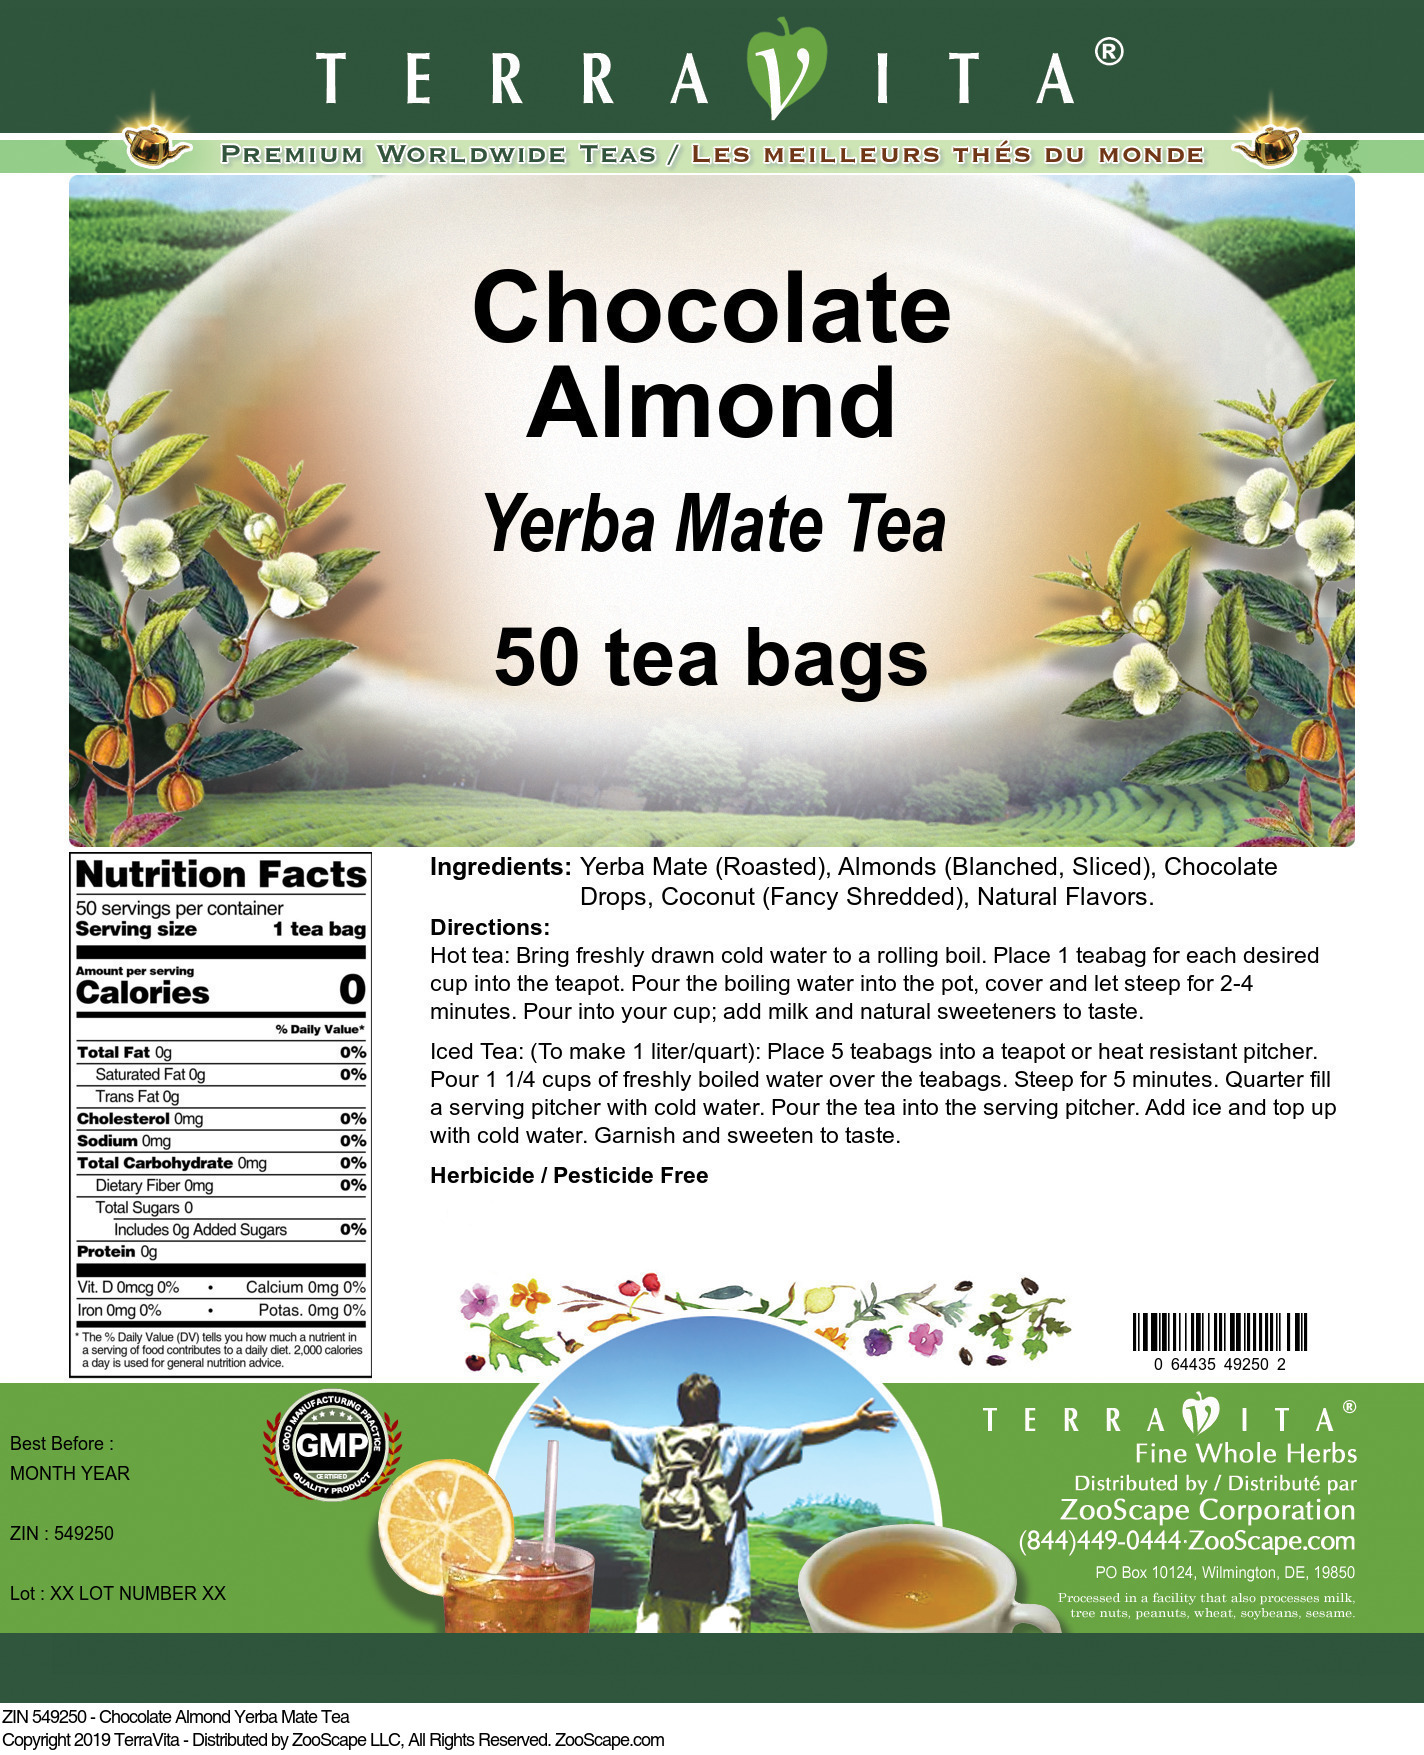 Chocolate Almond Yerba Mate Tea